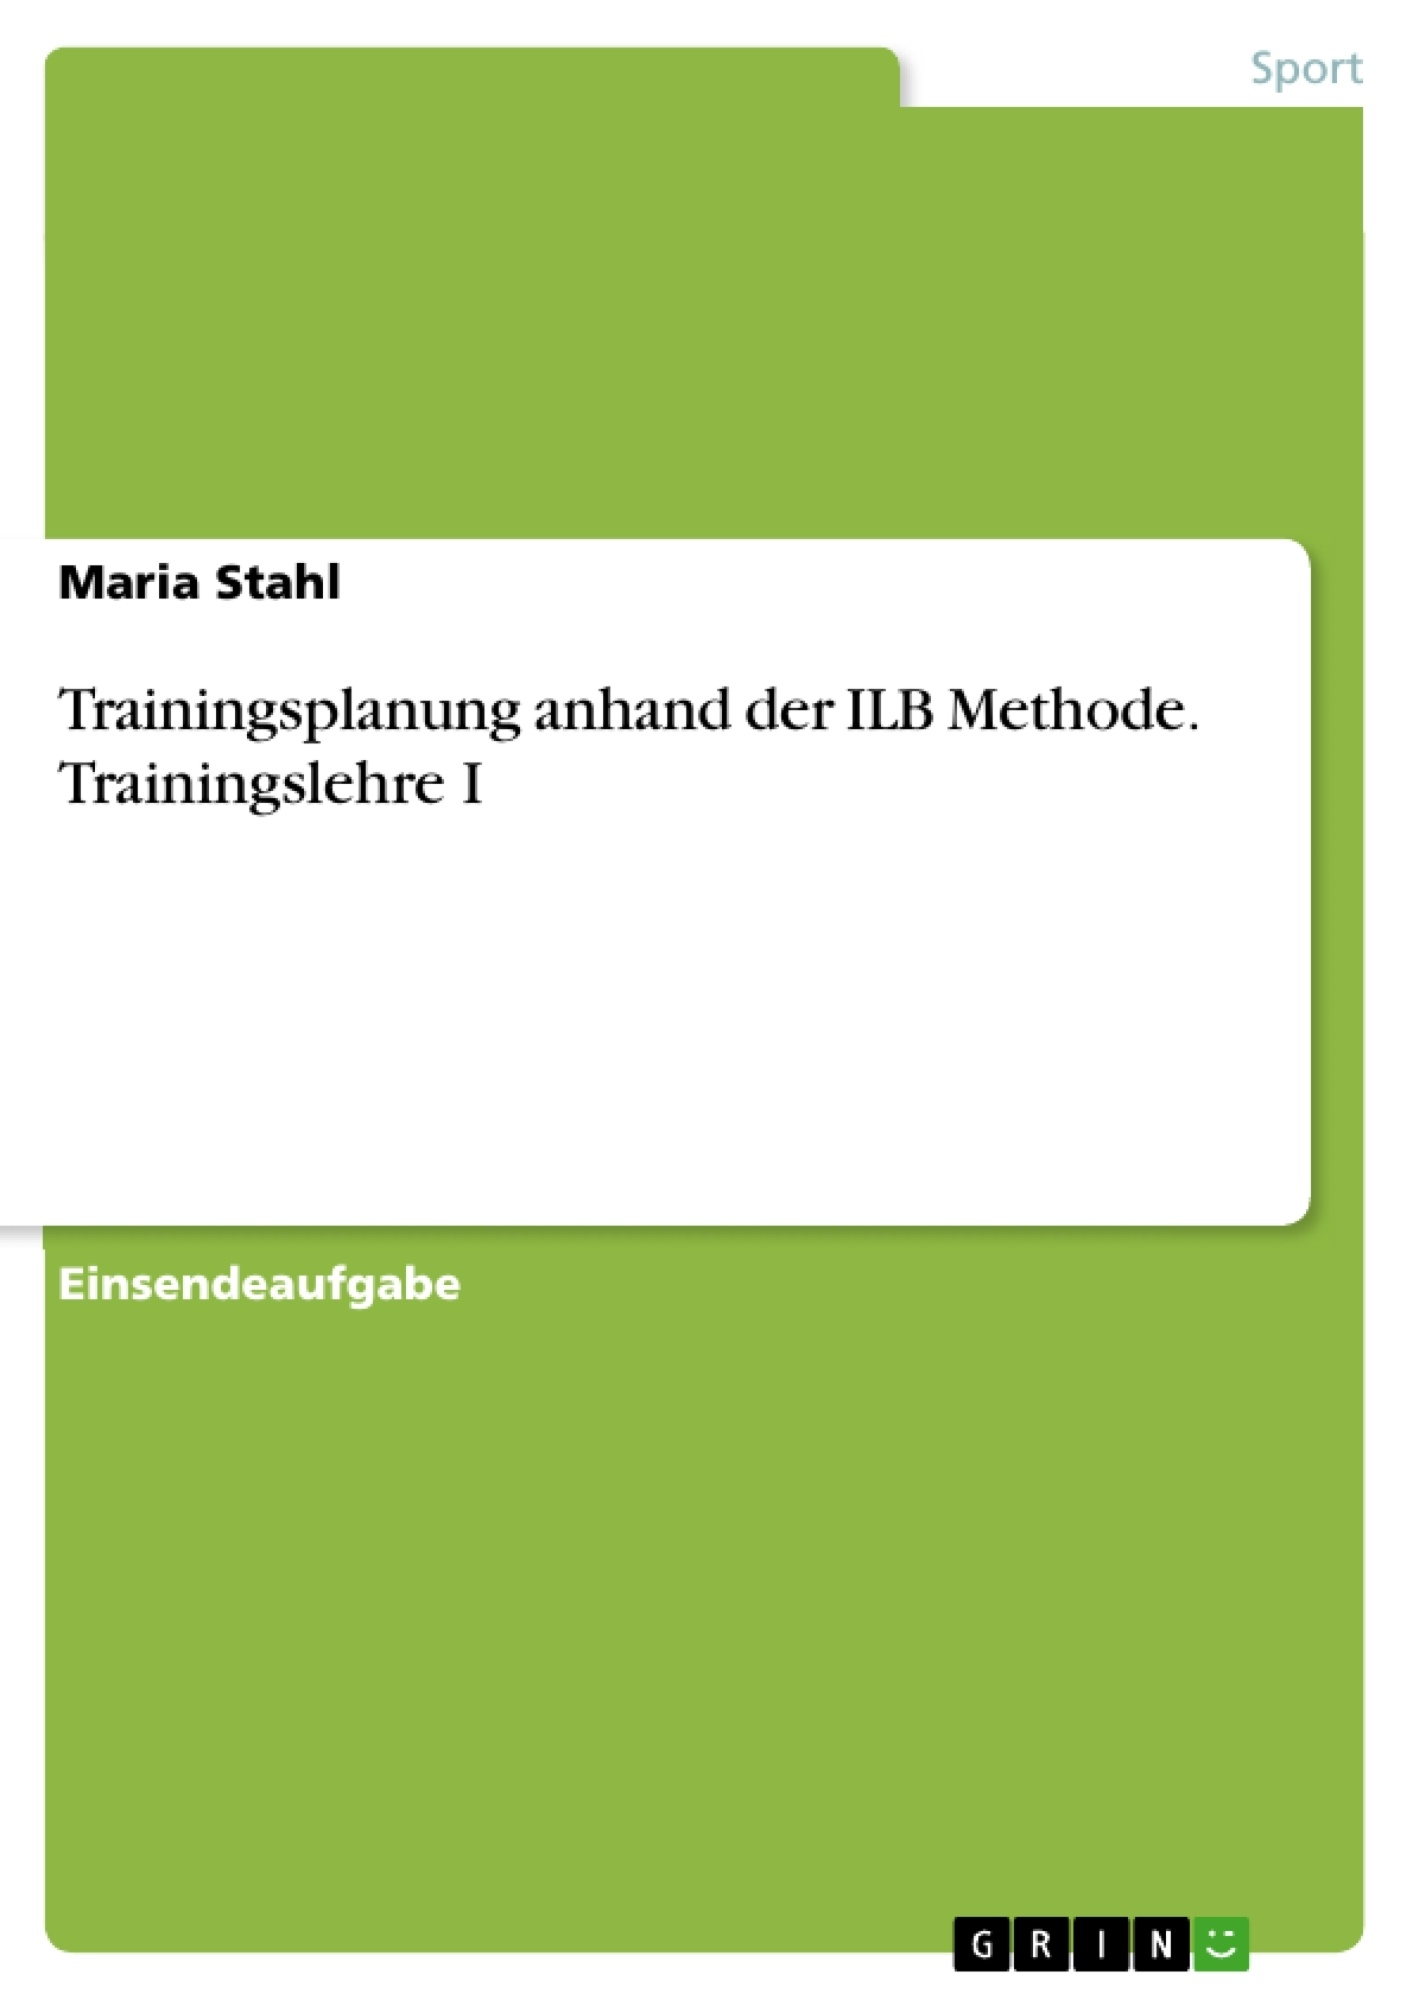 Titel: Trainingsplanung anhand der ILB Methode. Trainingslehre I